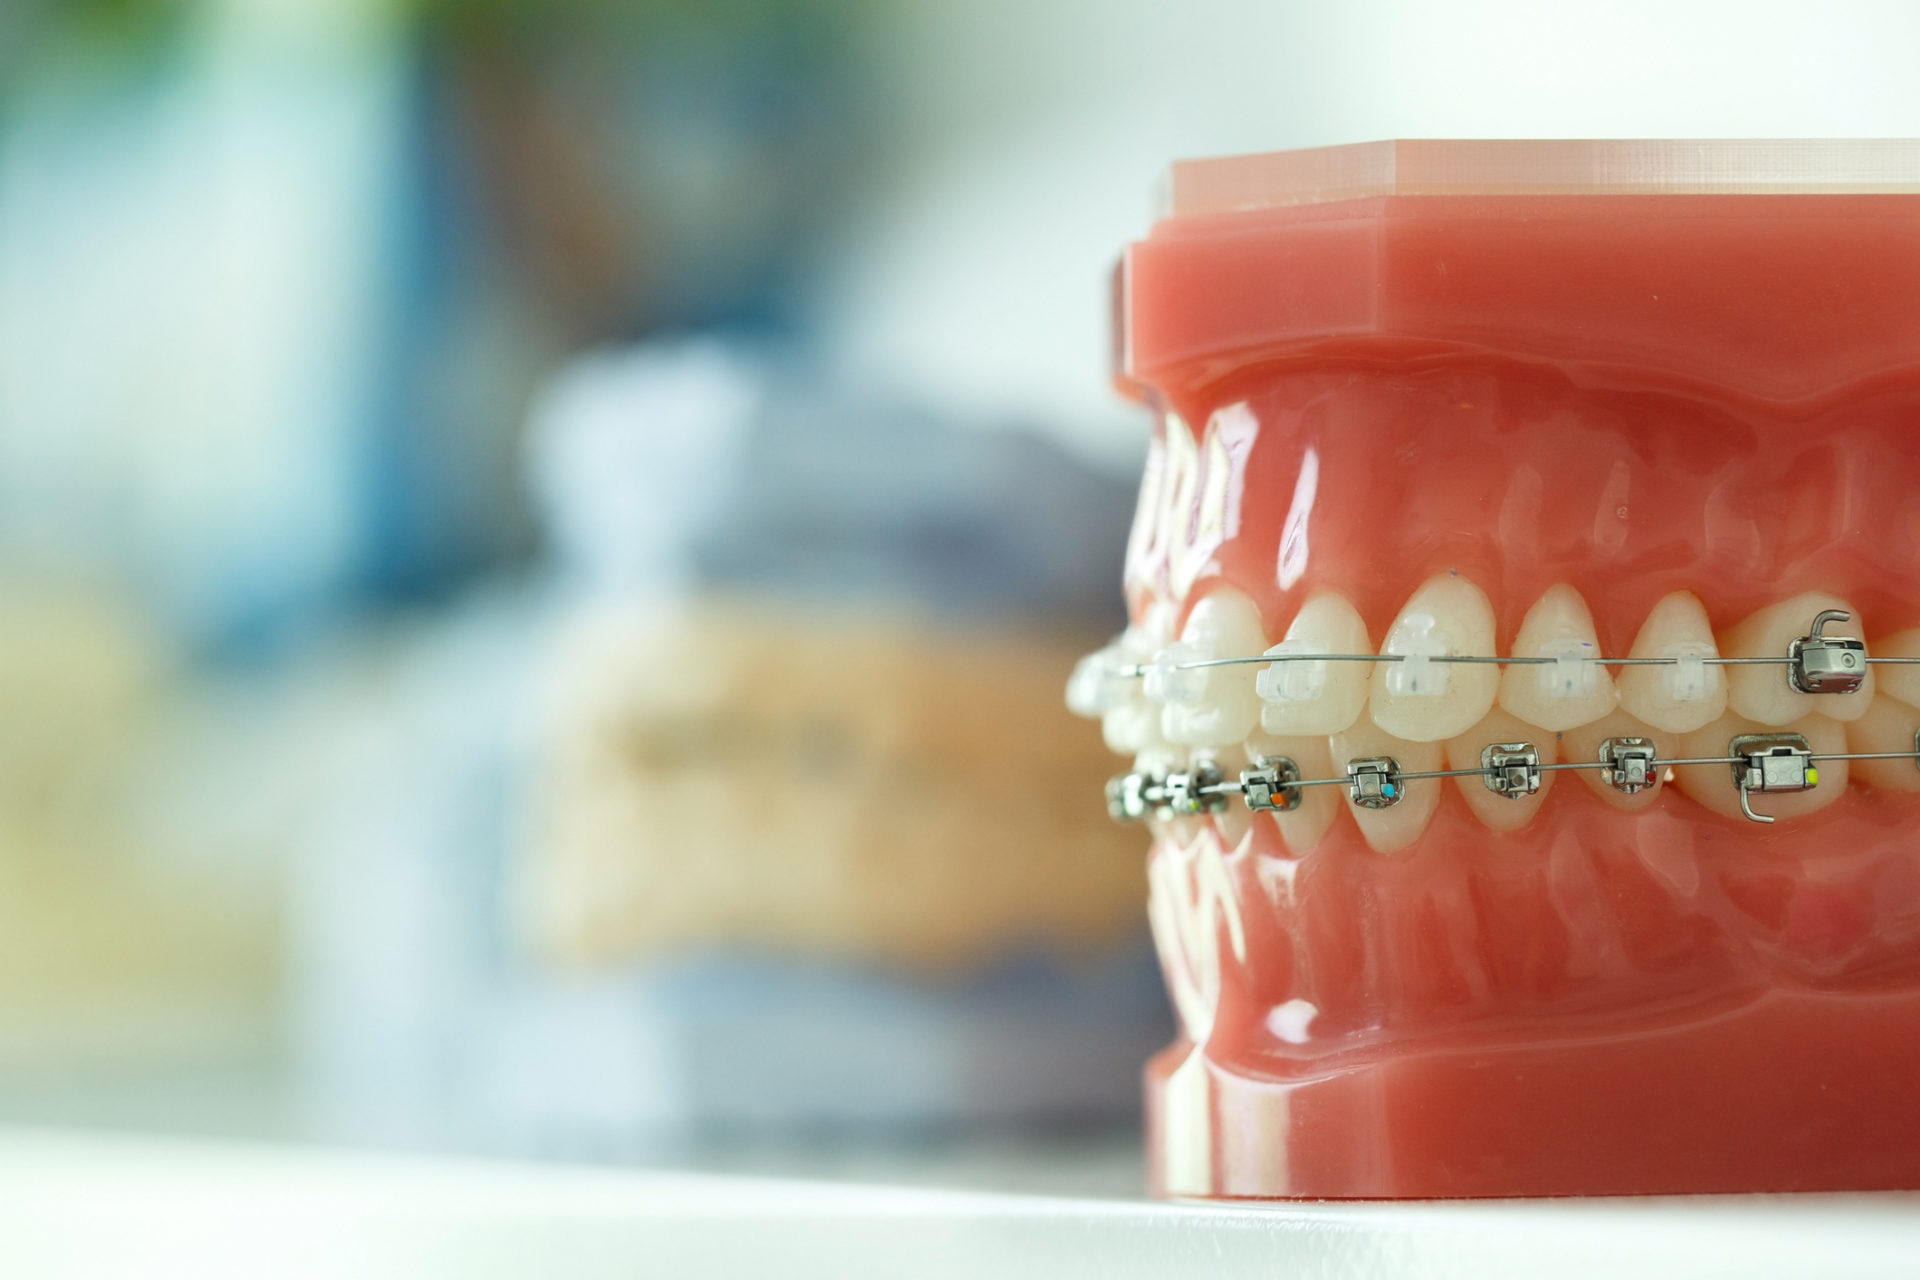 Table Of Orthodontics Practice Receiving Expert IT Support